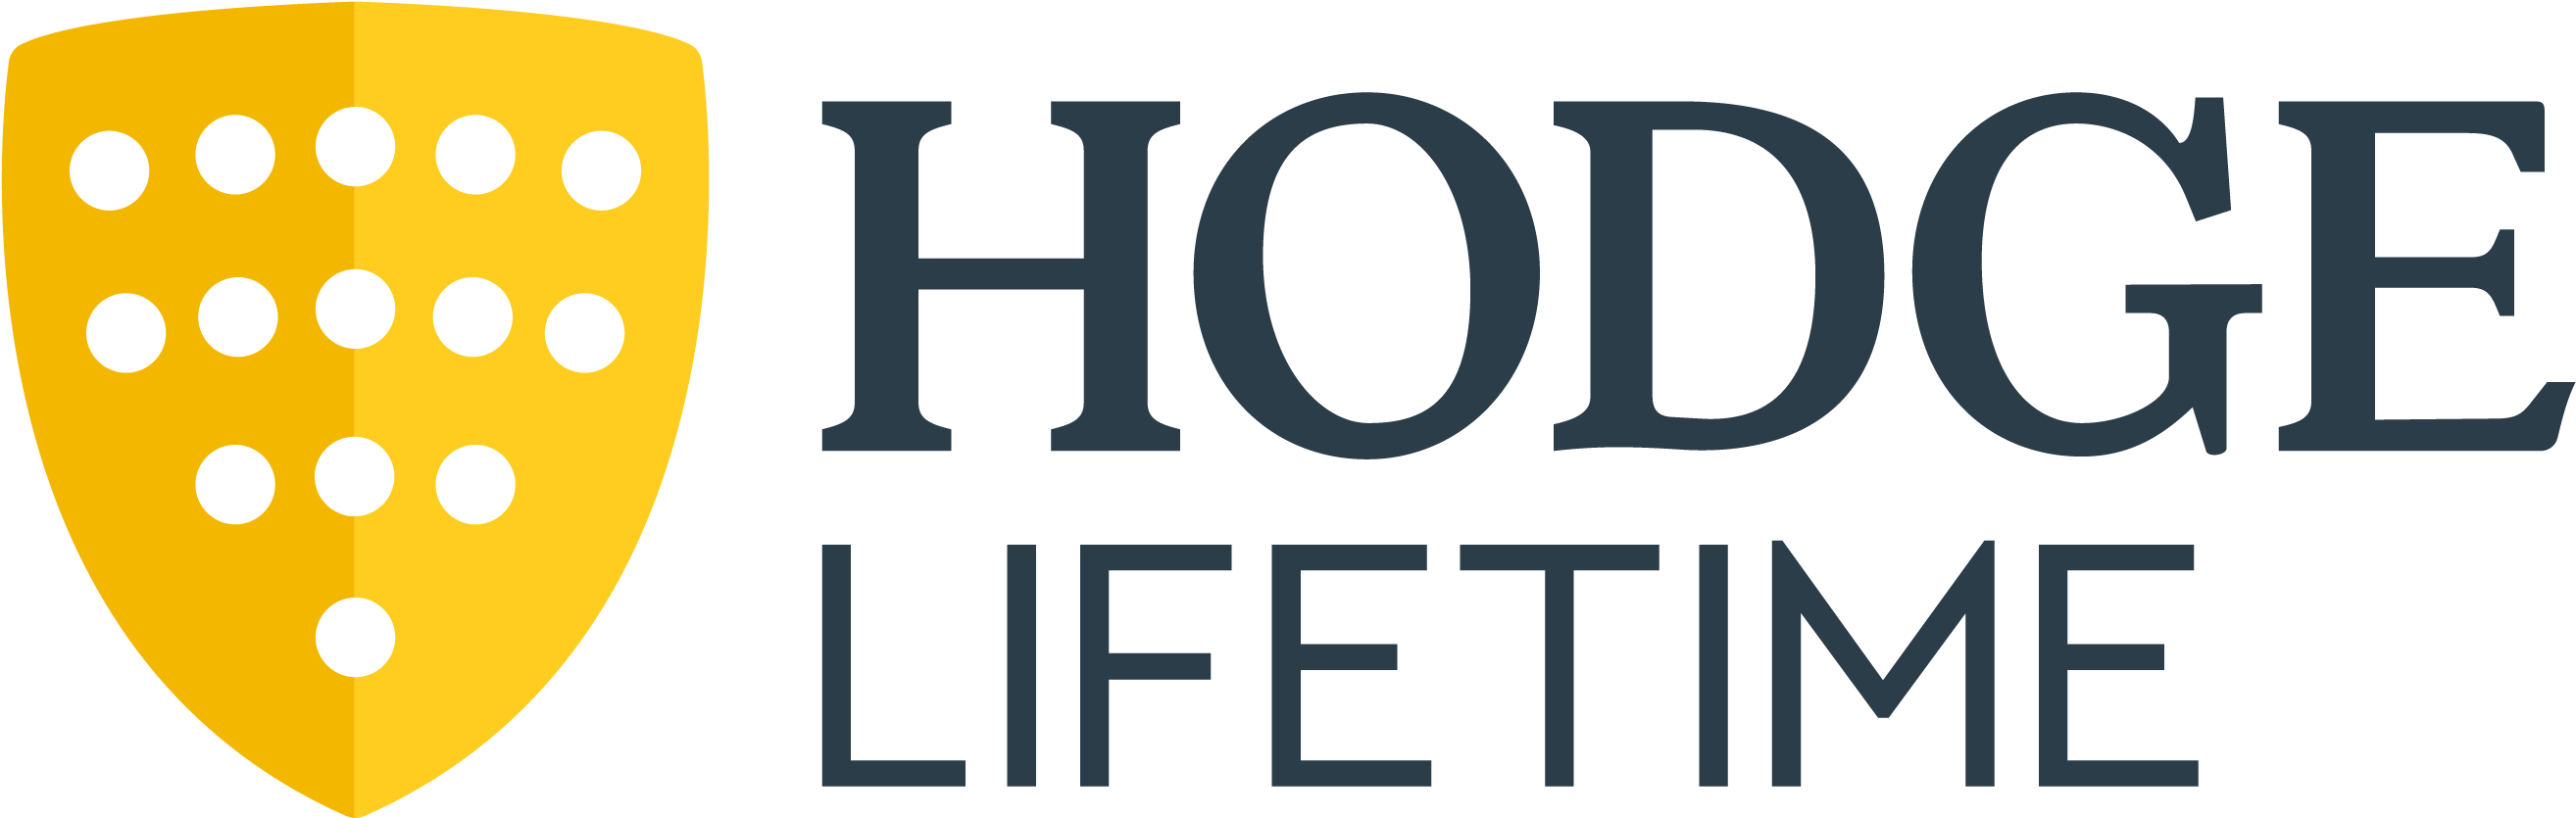 Hodge Lifetime equity release logo